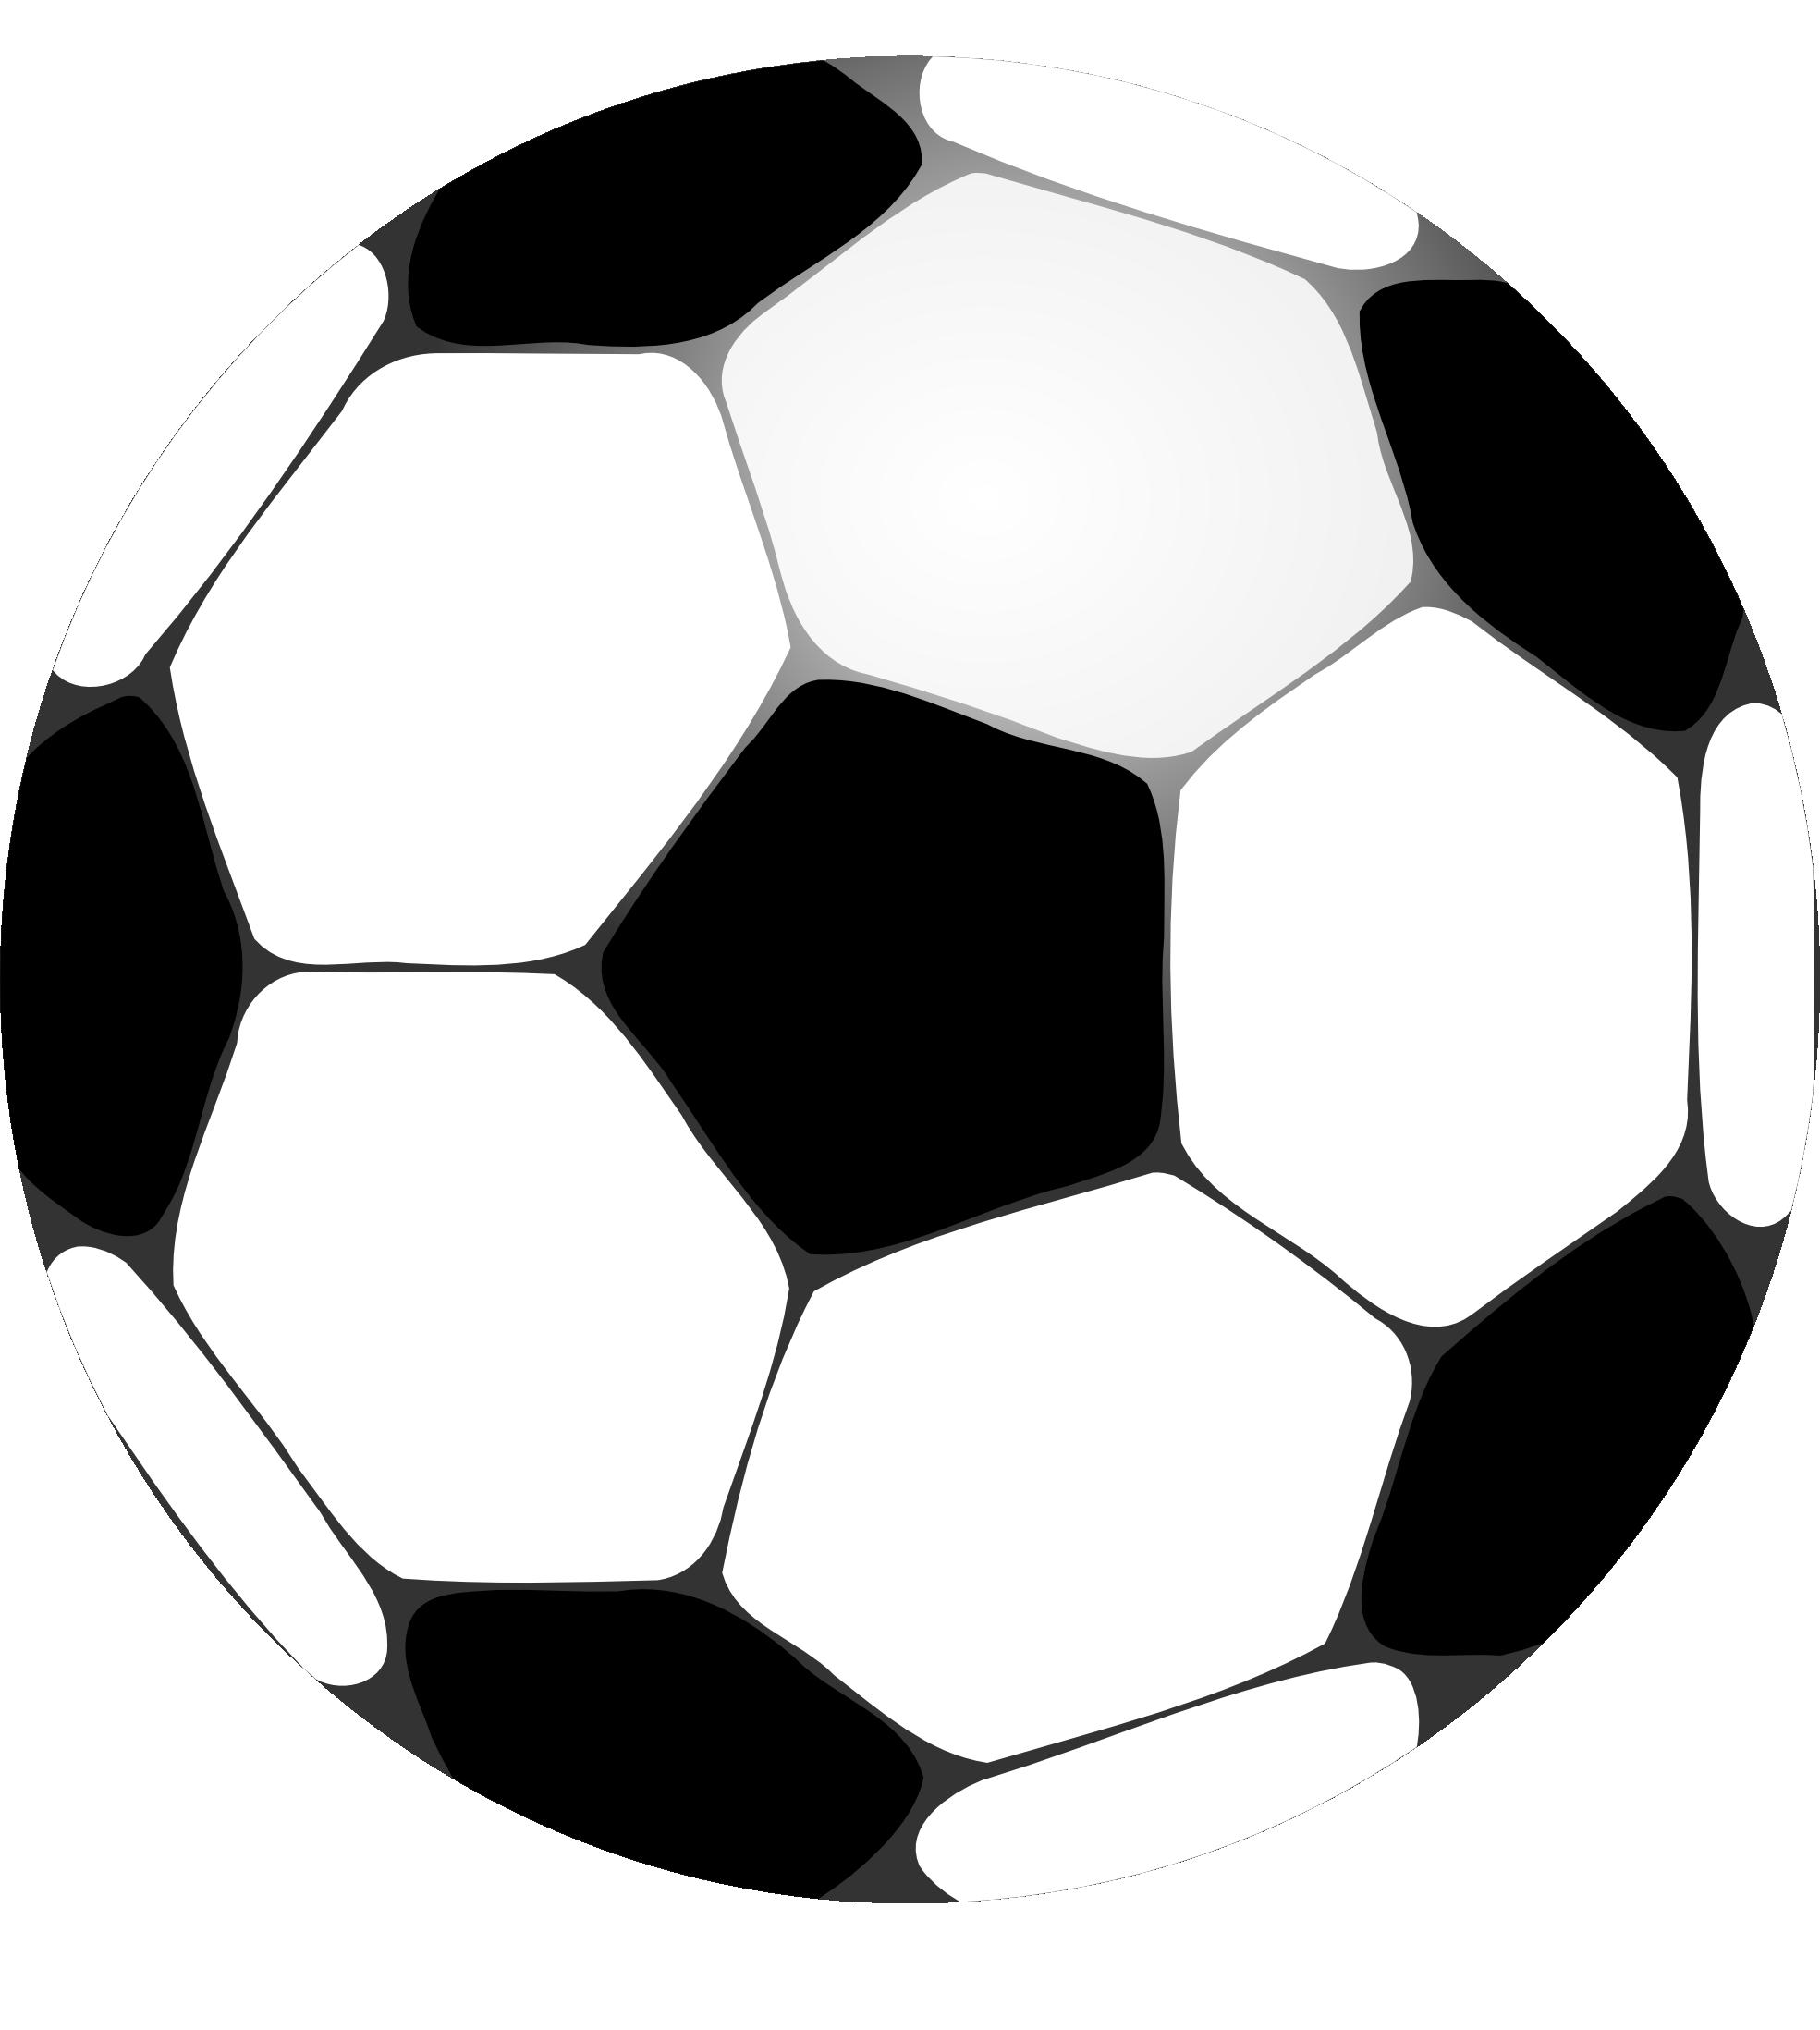 Heart clipart soccer. Clip art football free